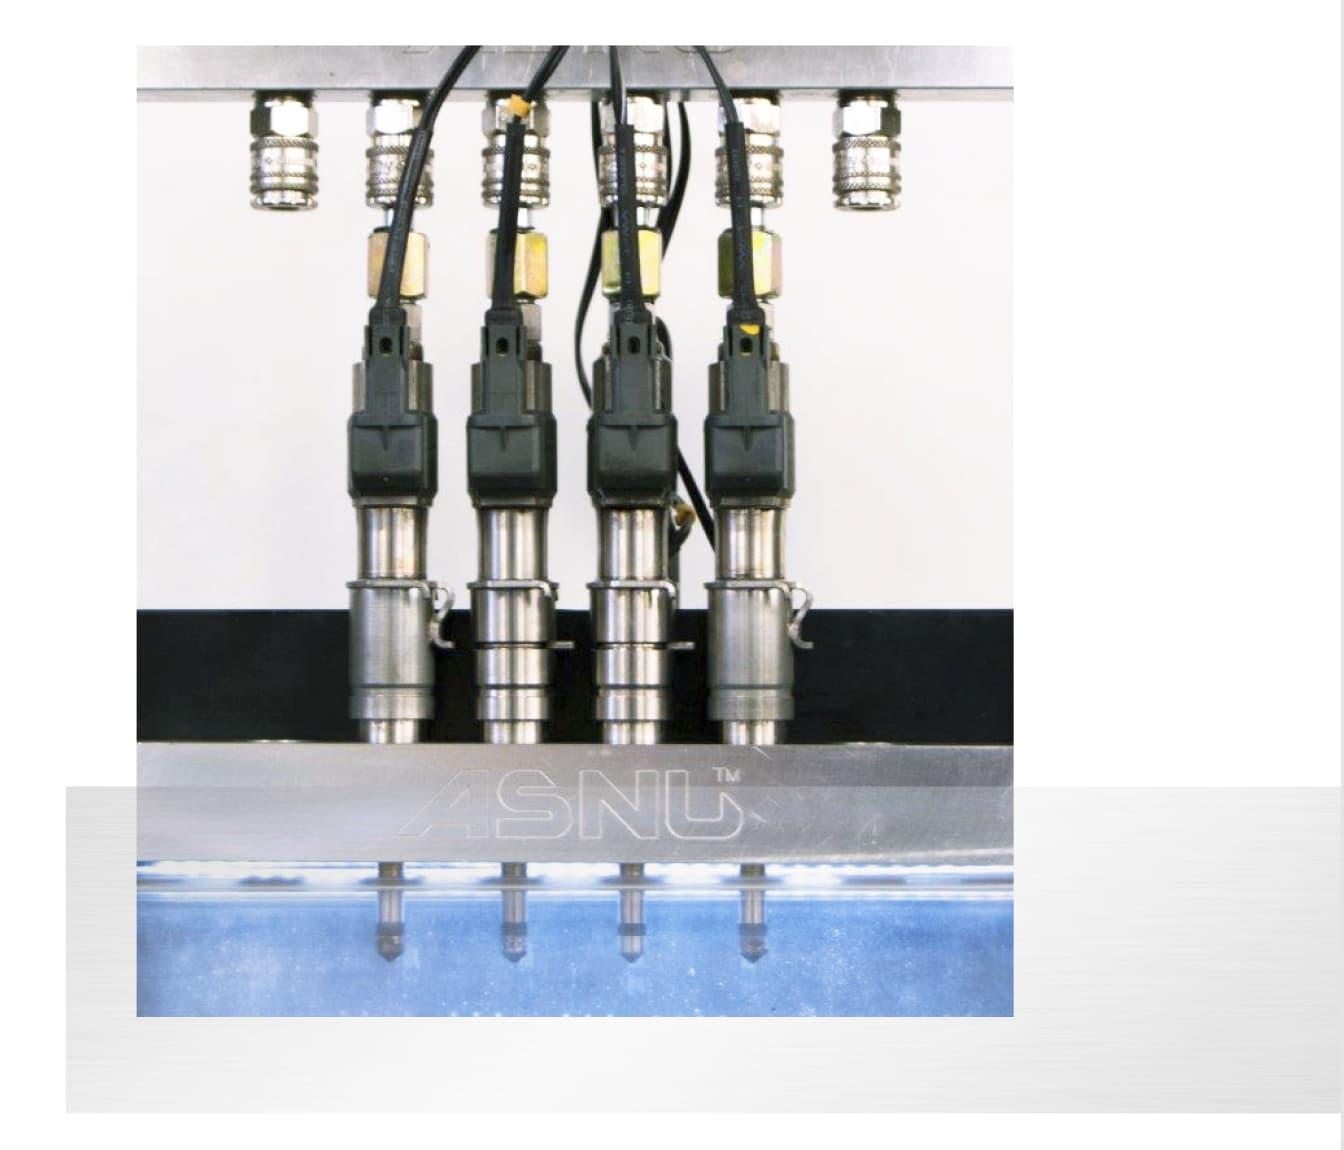 Image gasoline